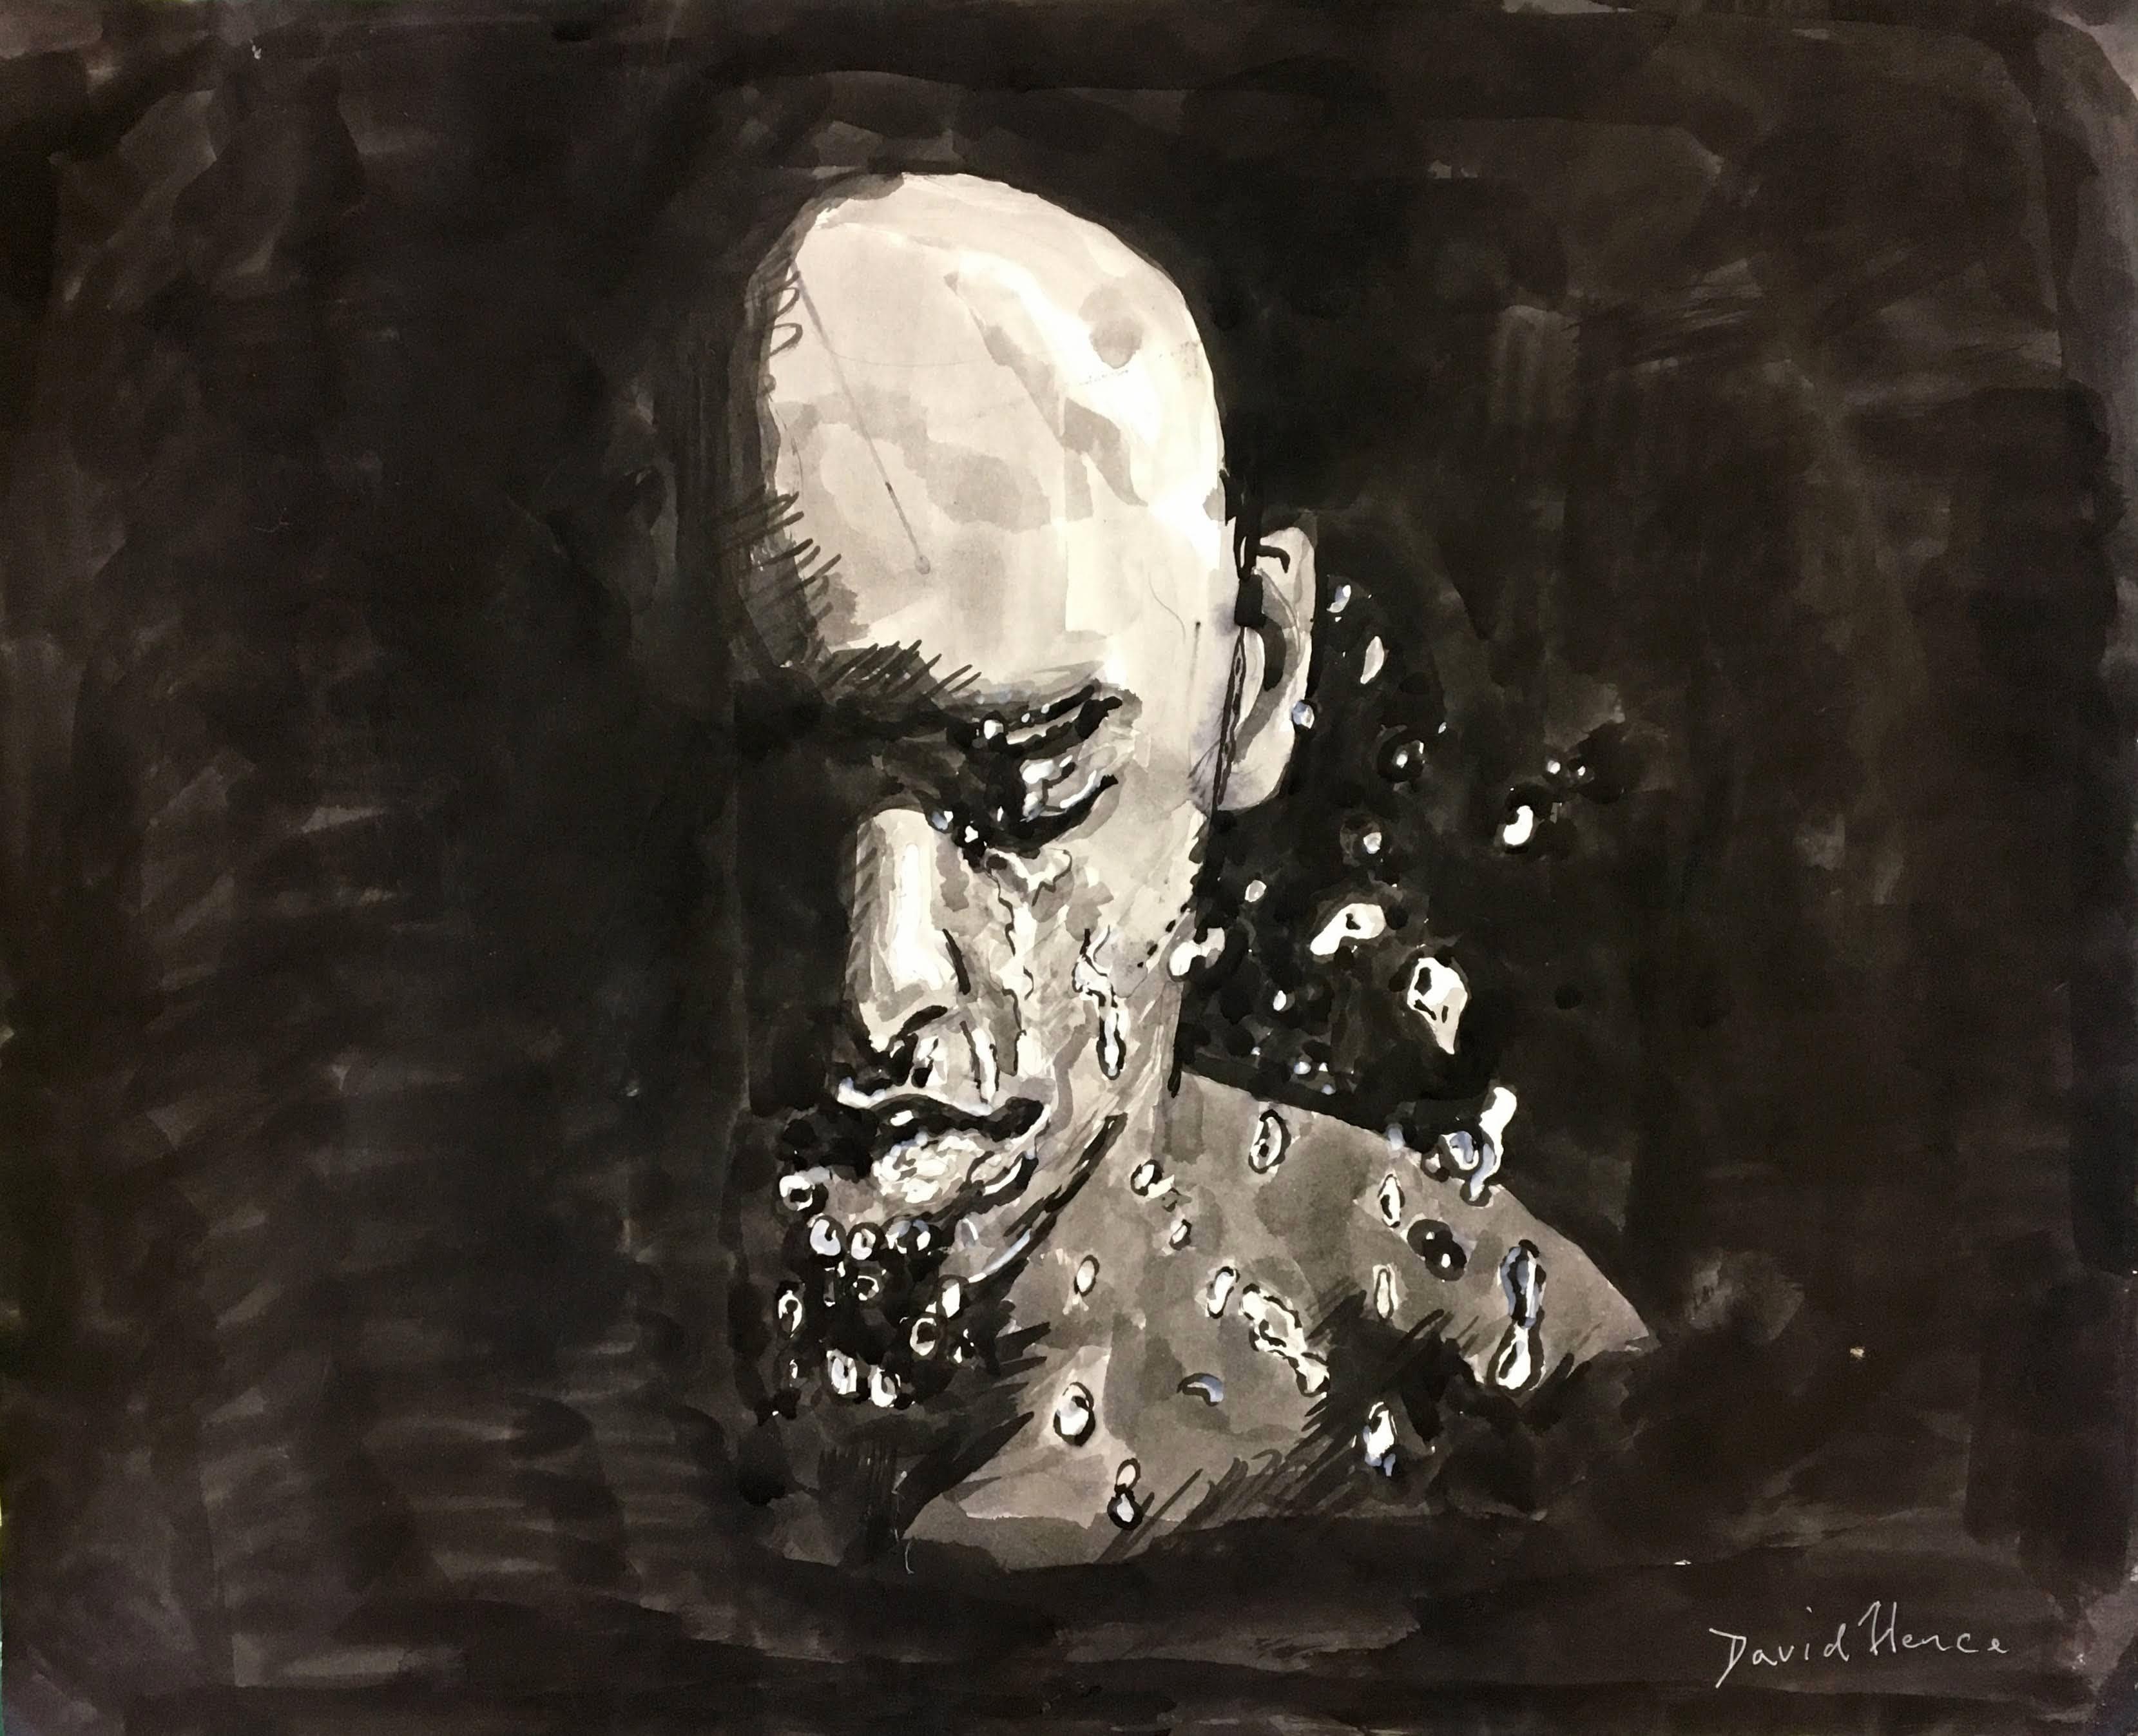 """Pain"" by David Hence"